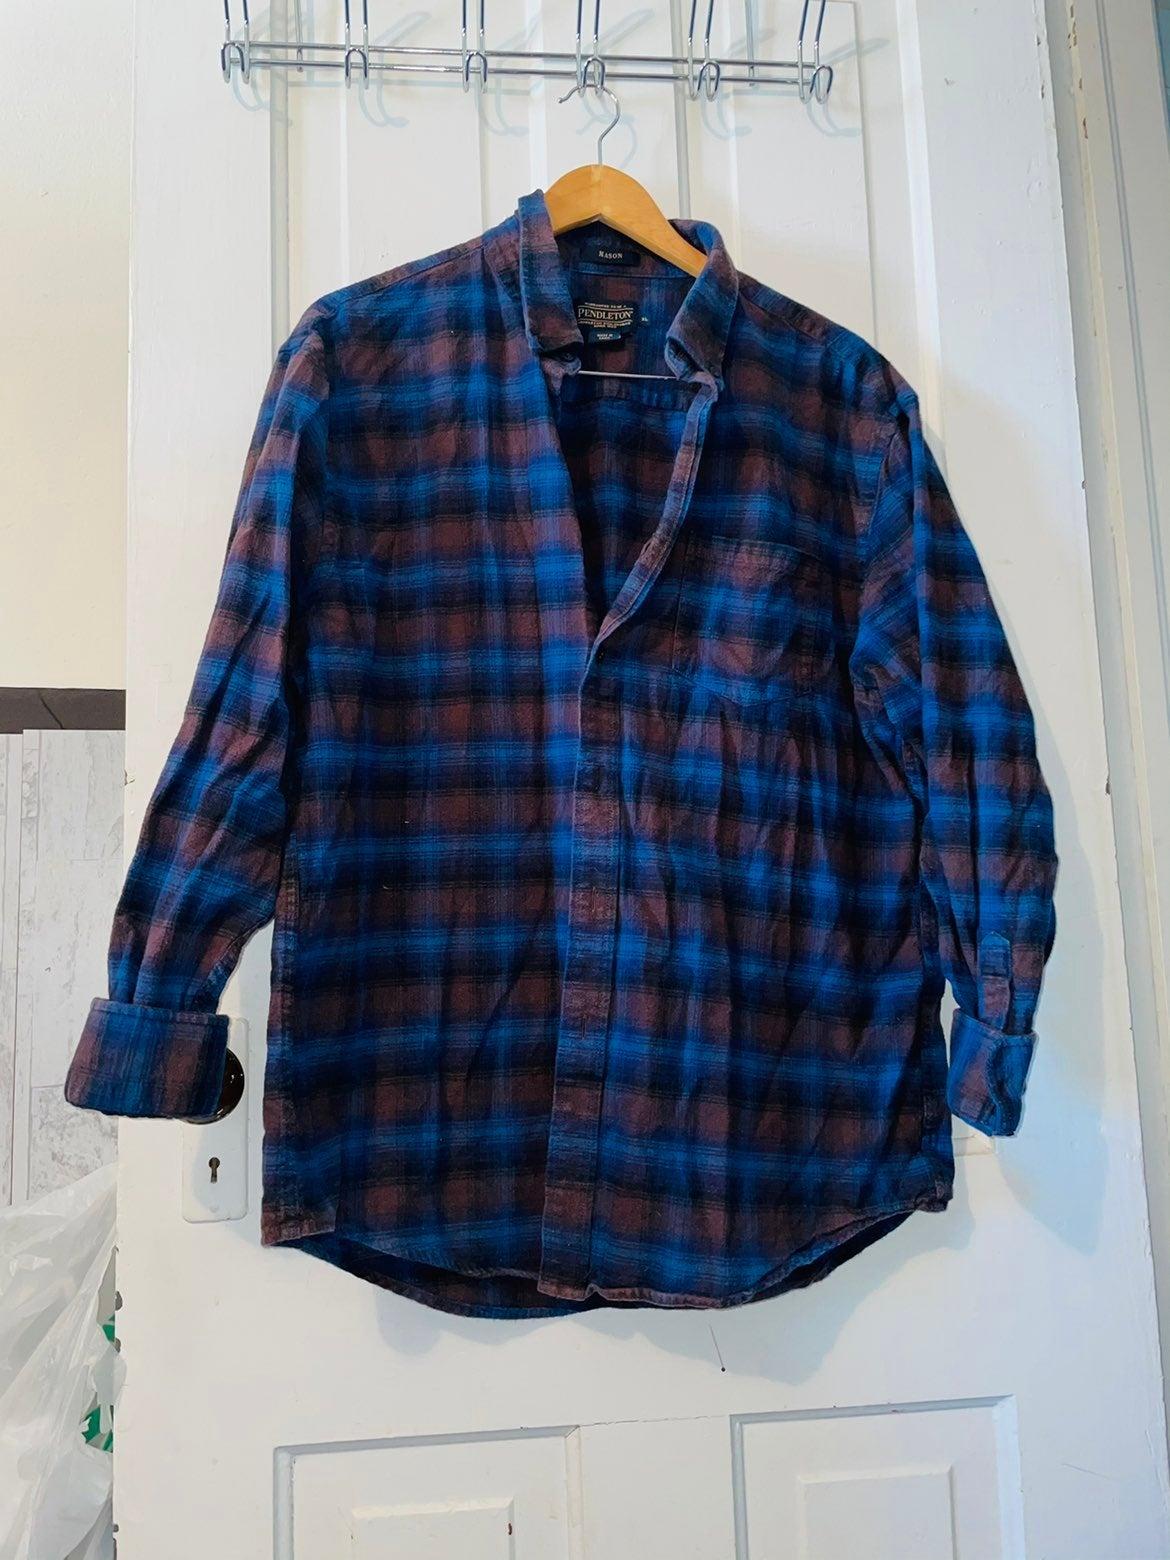 Pendelton MASON Flannel Buttondown